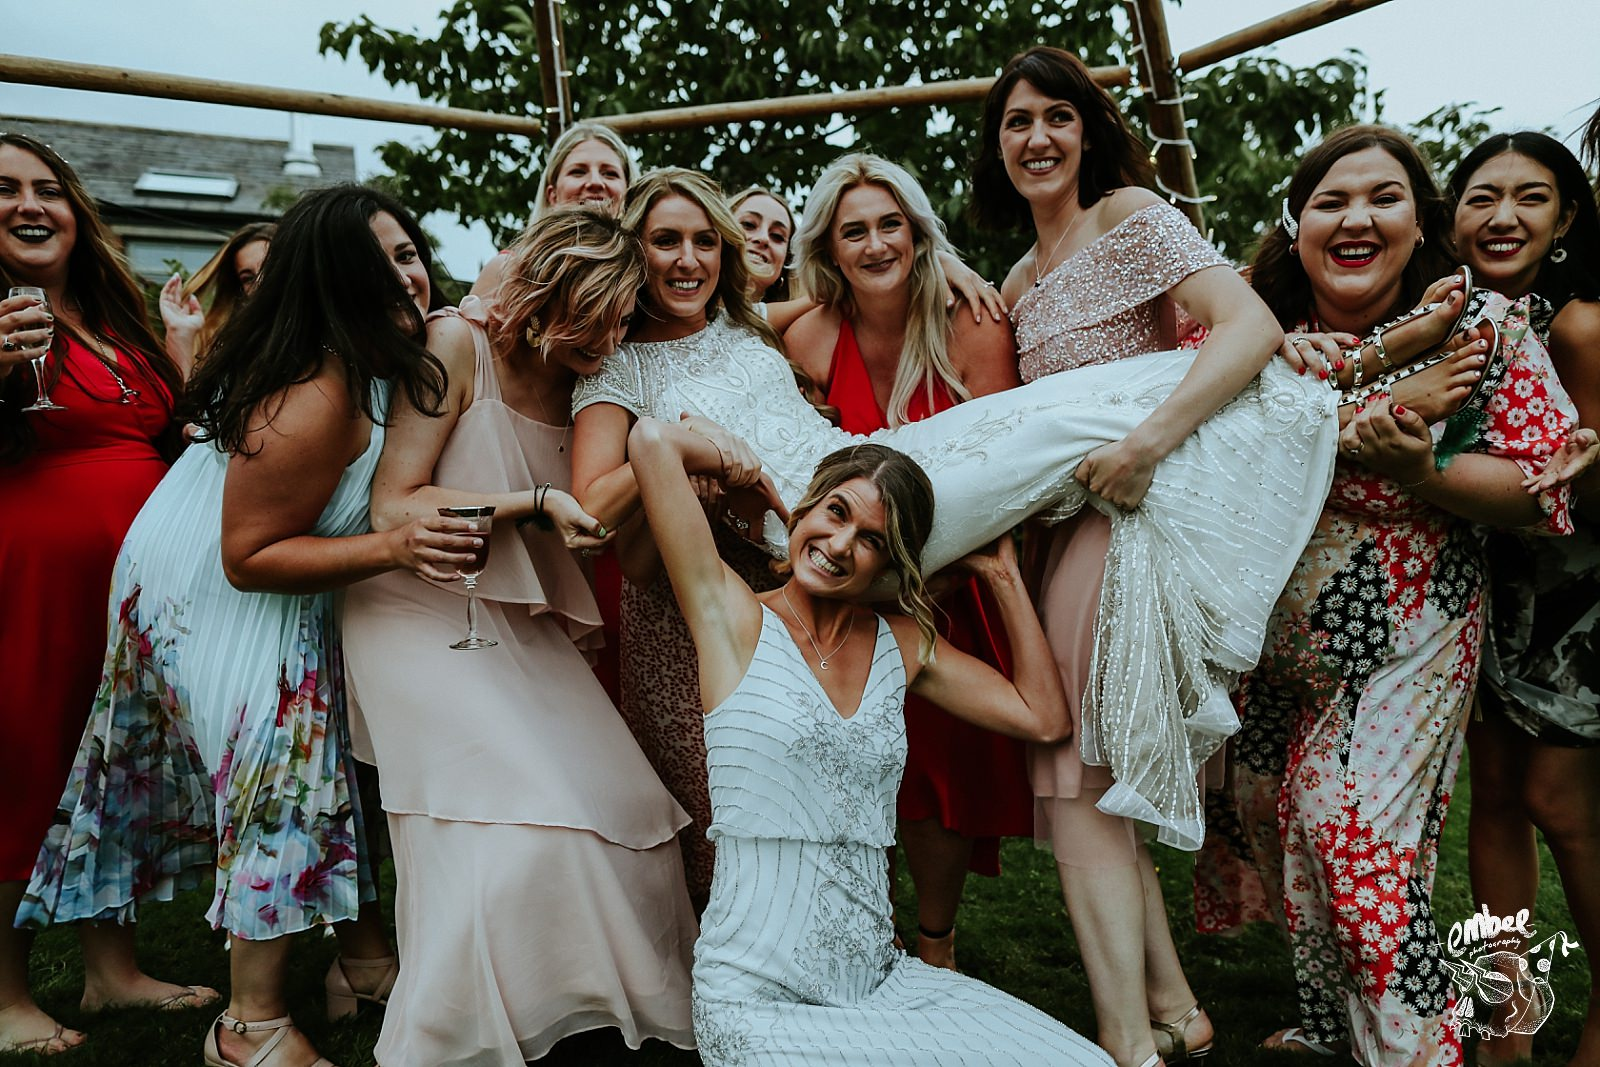 bridemaids lift up bride on her wedding